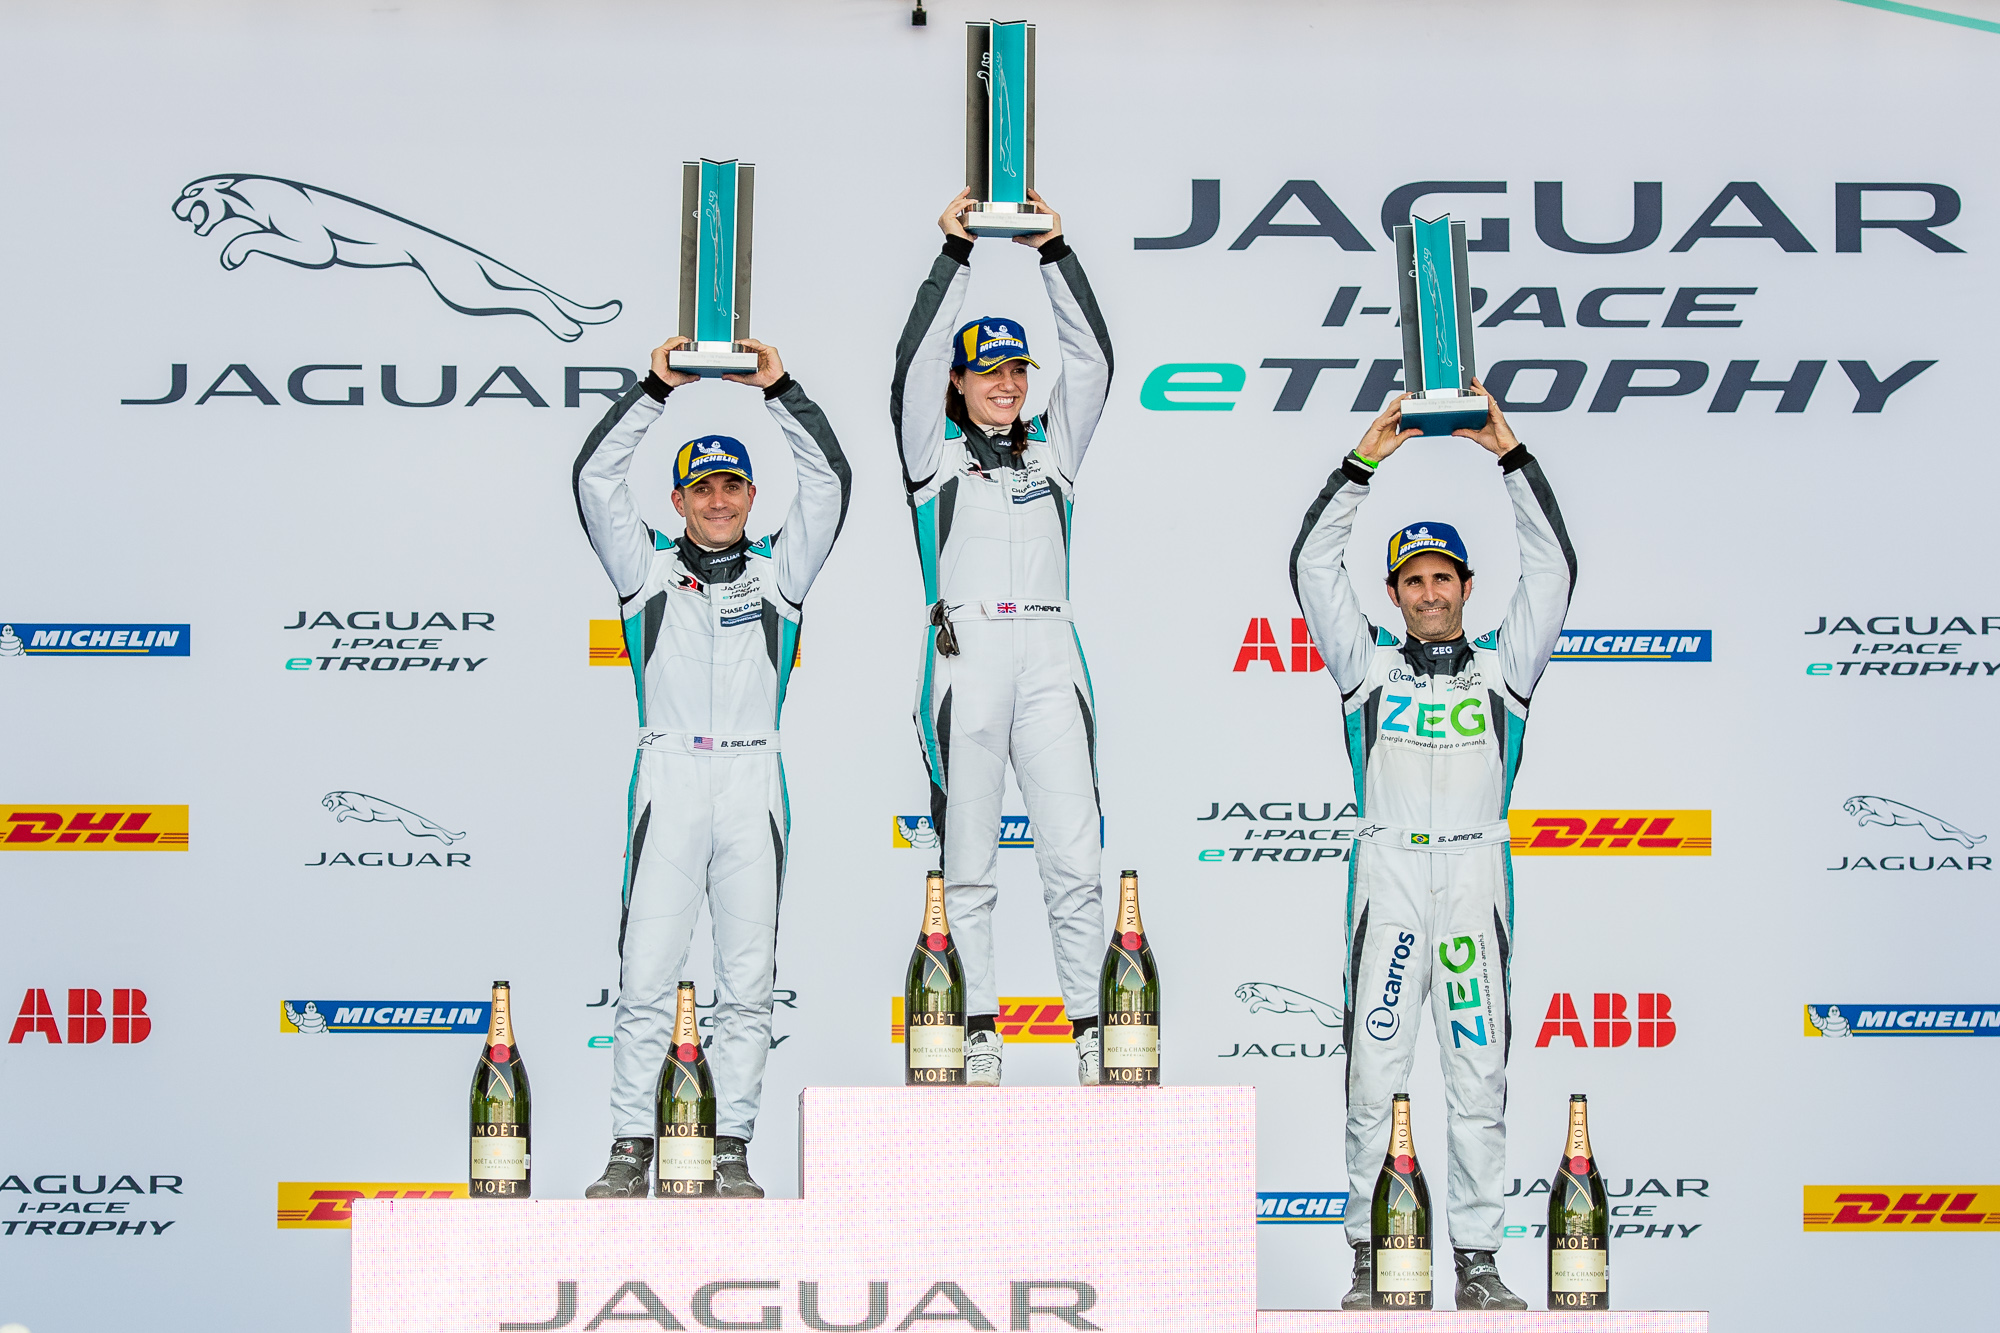 JaguarBR_4.Mexico_josemariodias_09033